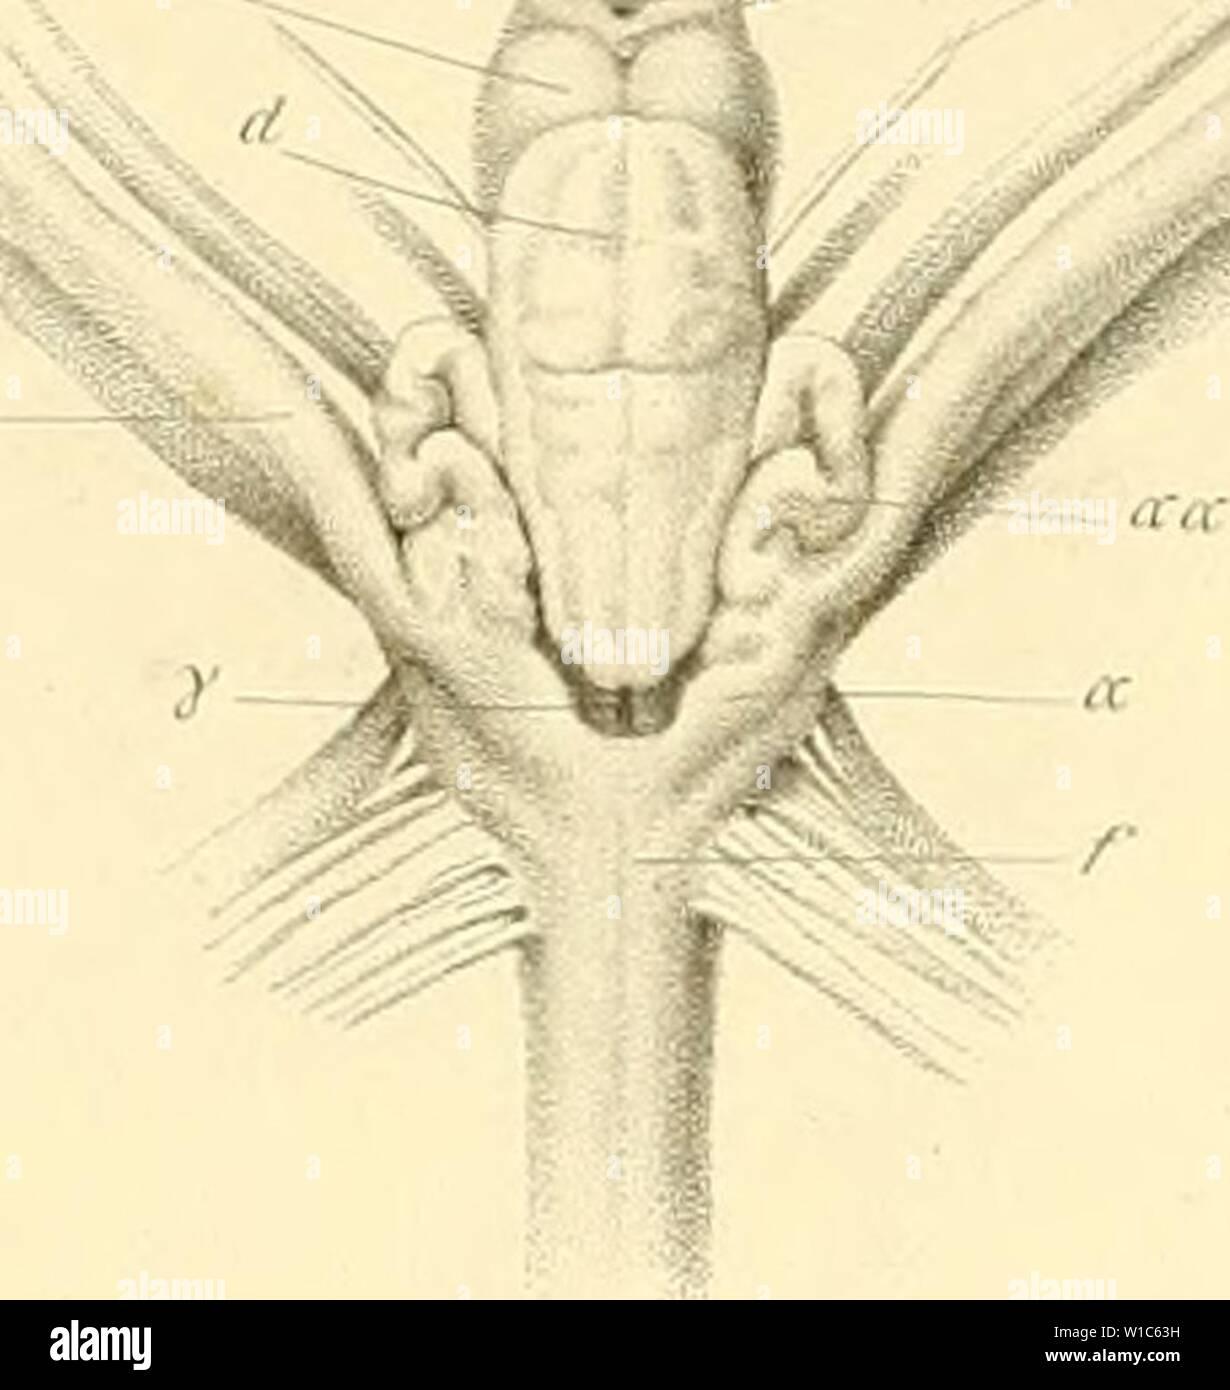 Archive image from page 54 of De selachiorum et ganoideorum encephalo Stock Photo